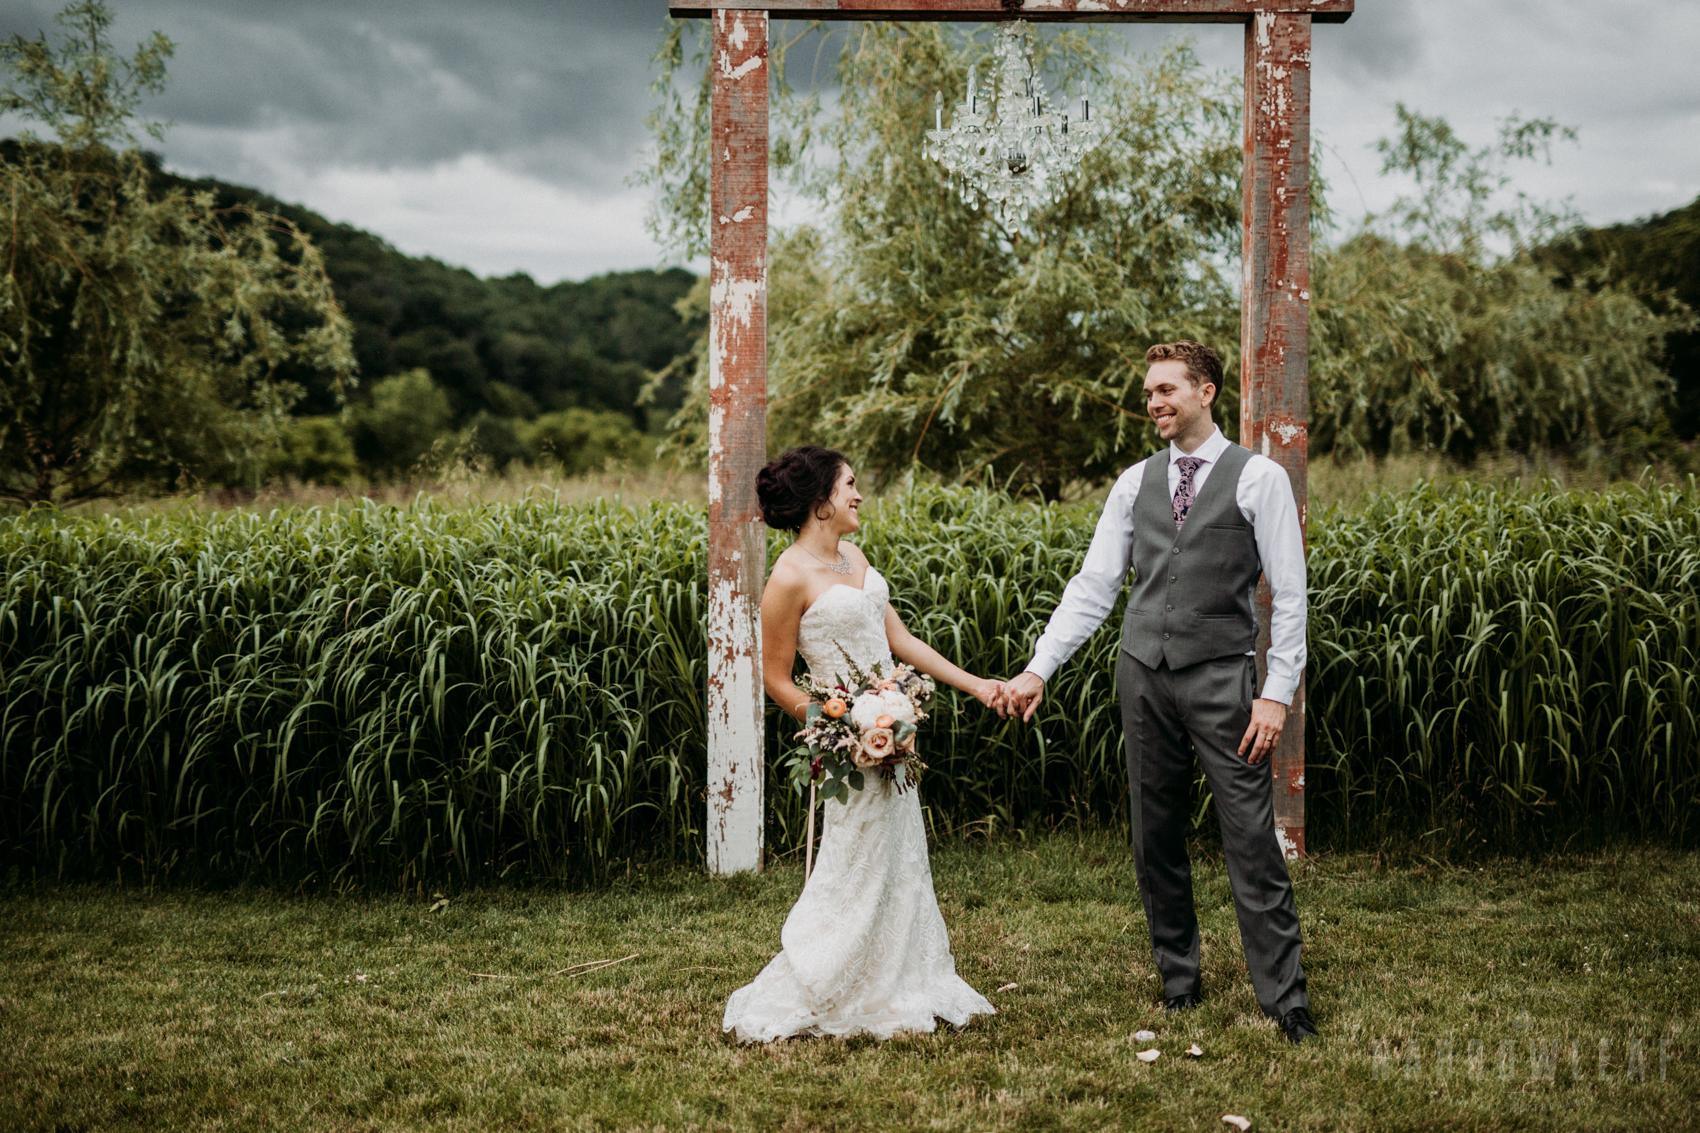 moody-bride-groom-photos-the-hidden-meadow-and-barn-pepin-wi-6.jpg